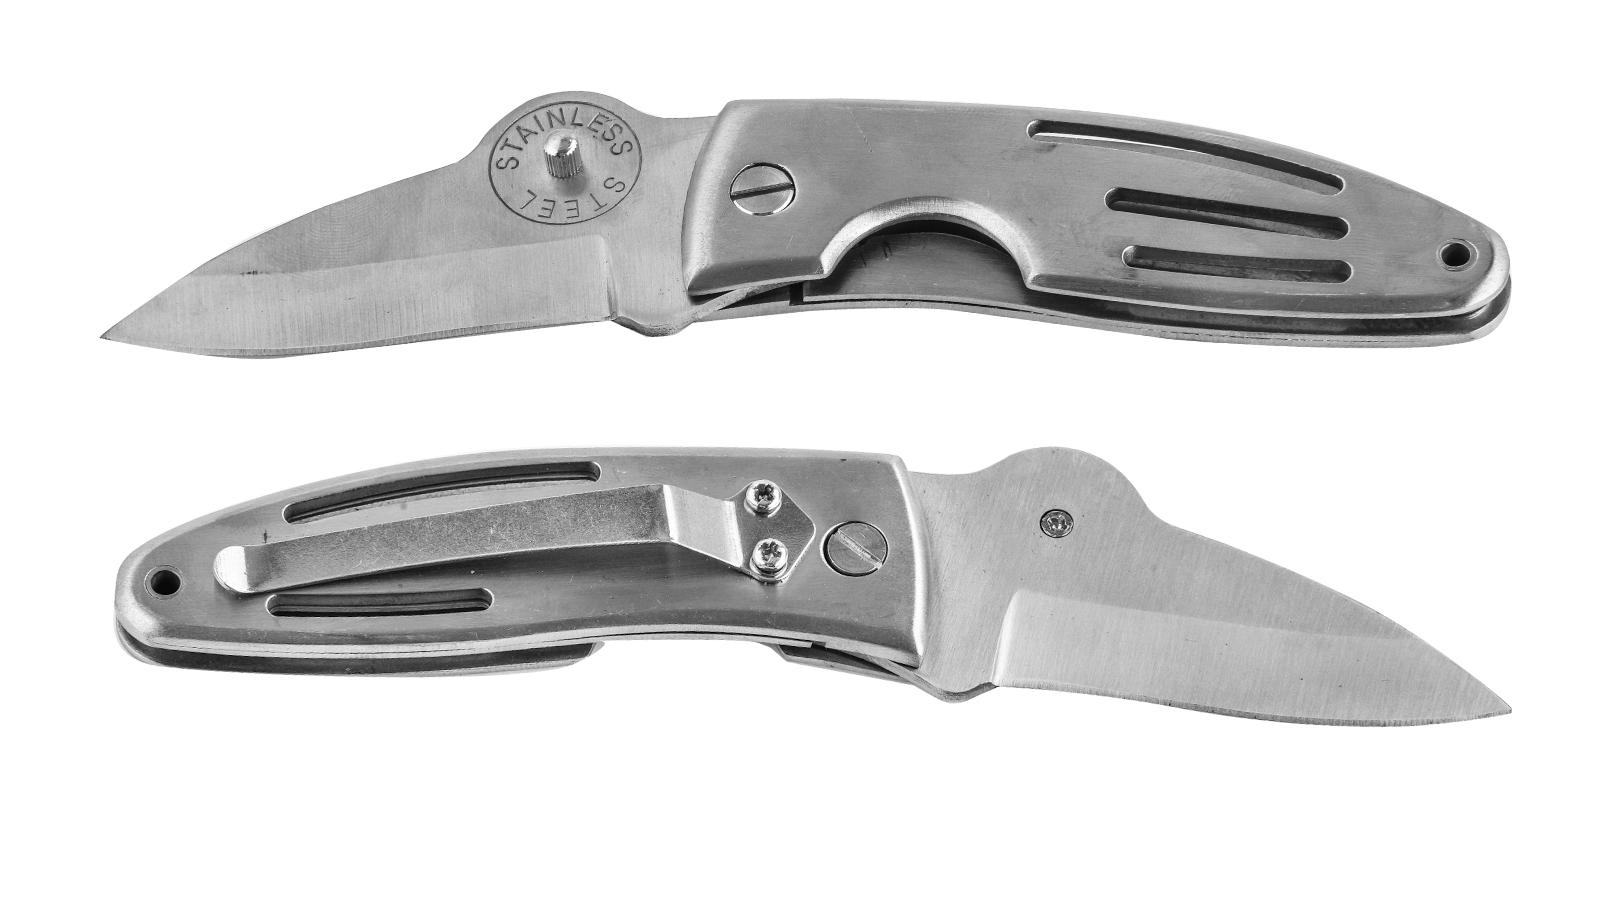 Карманный нож с коротким клинком